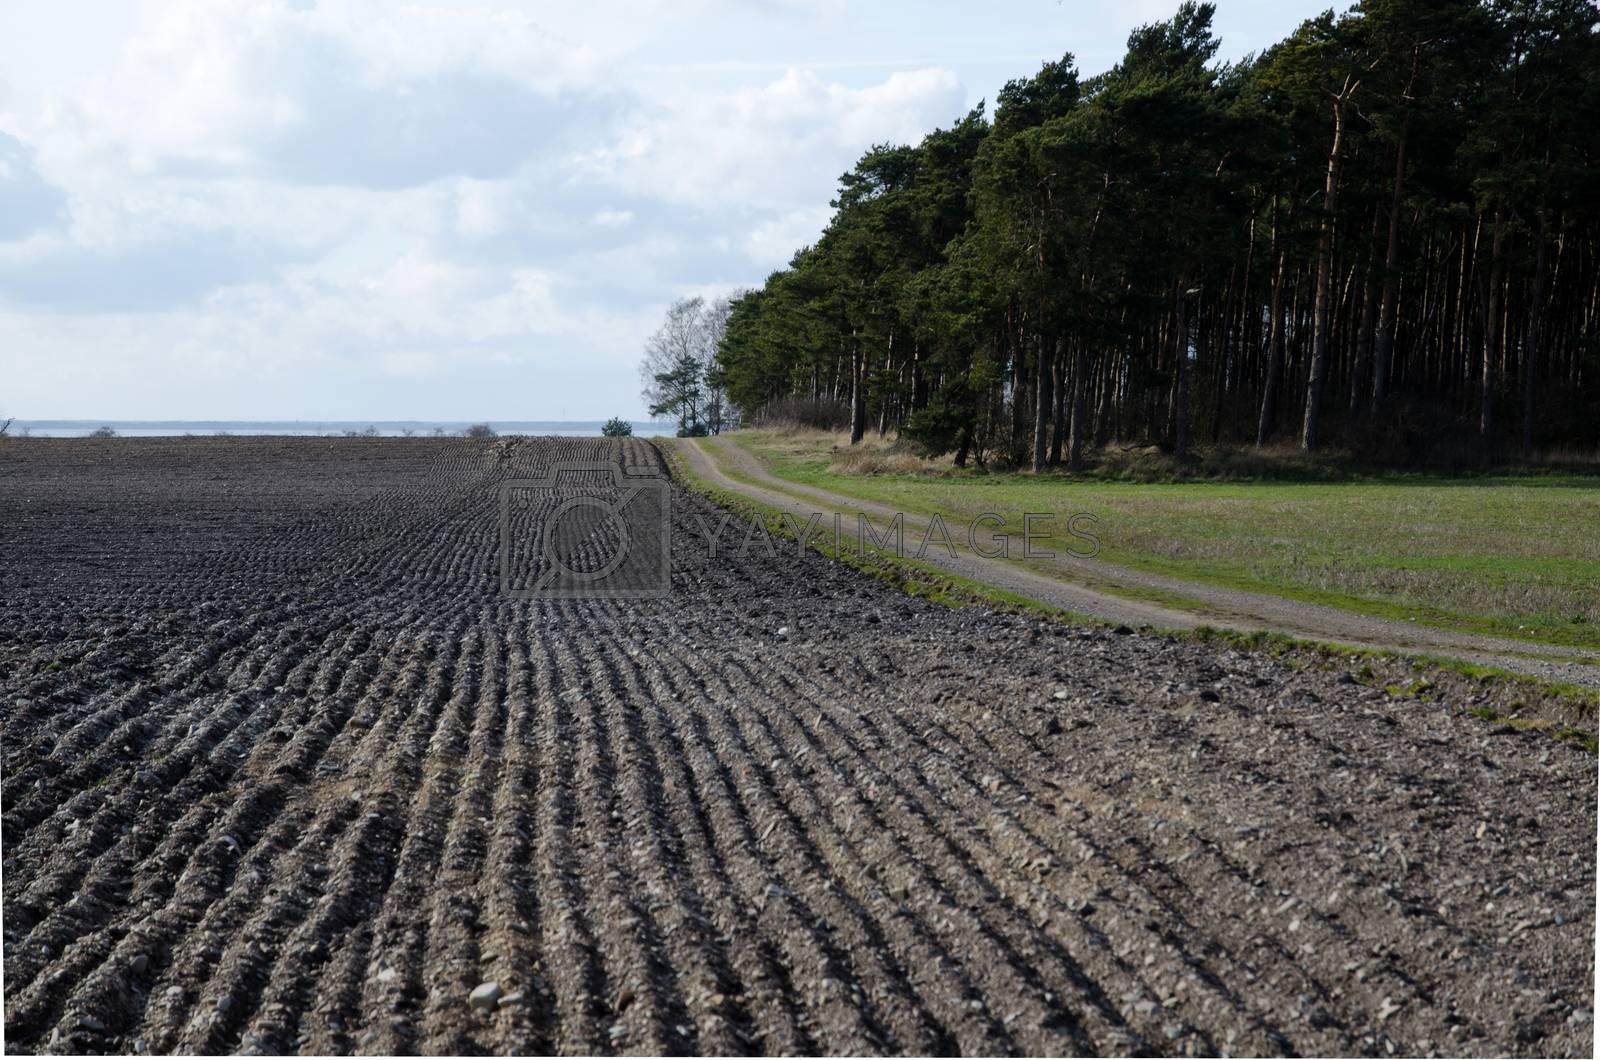 Field at springtime by olandsfokus